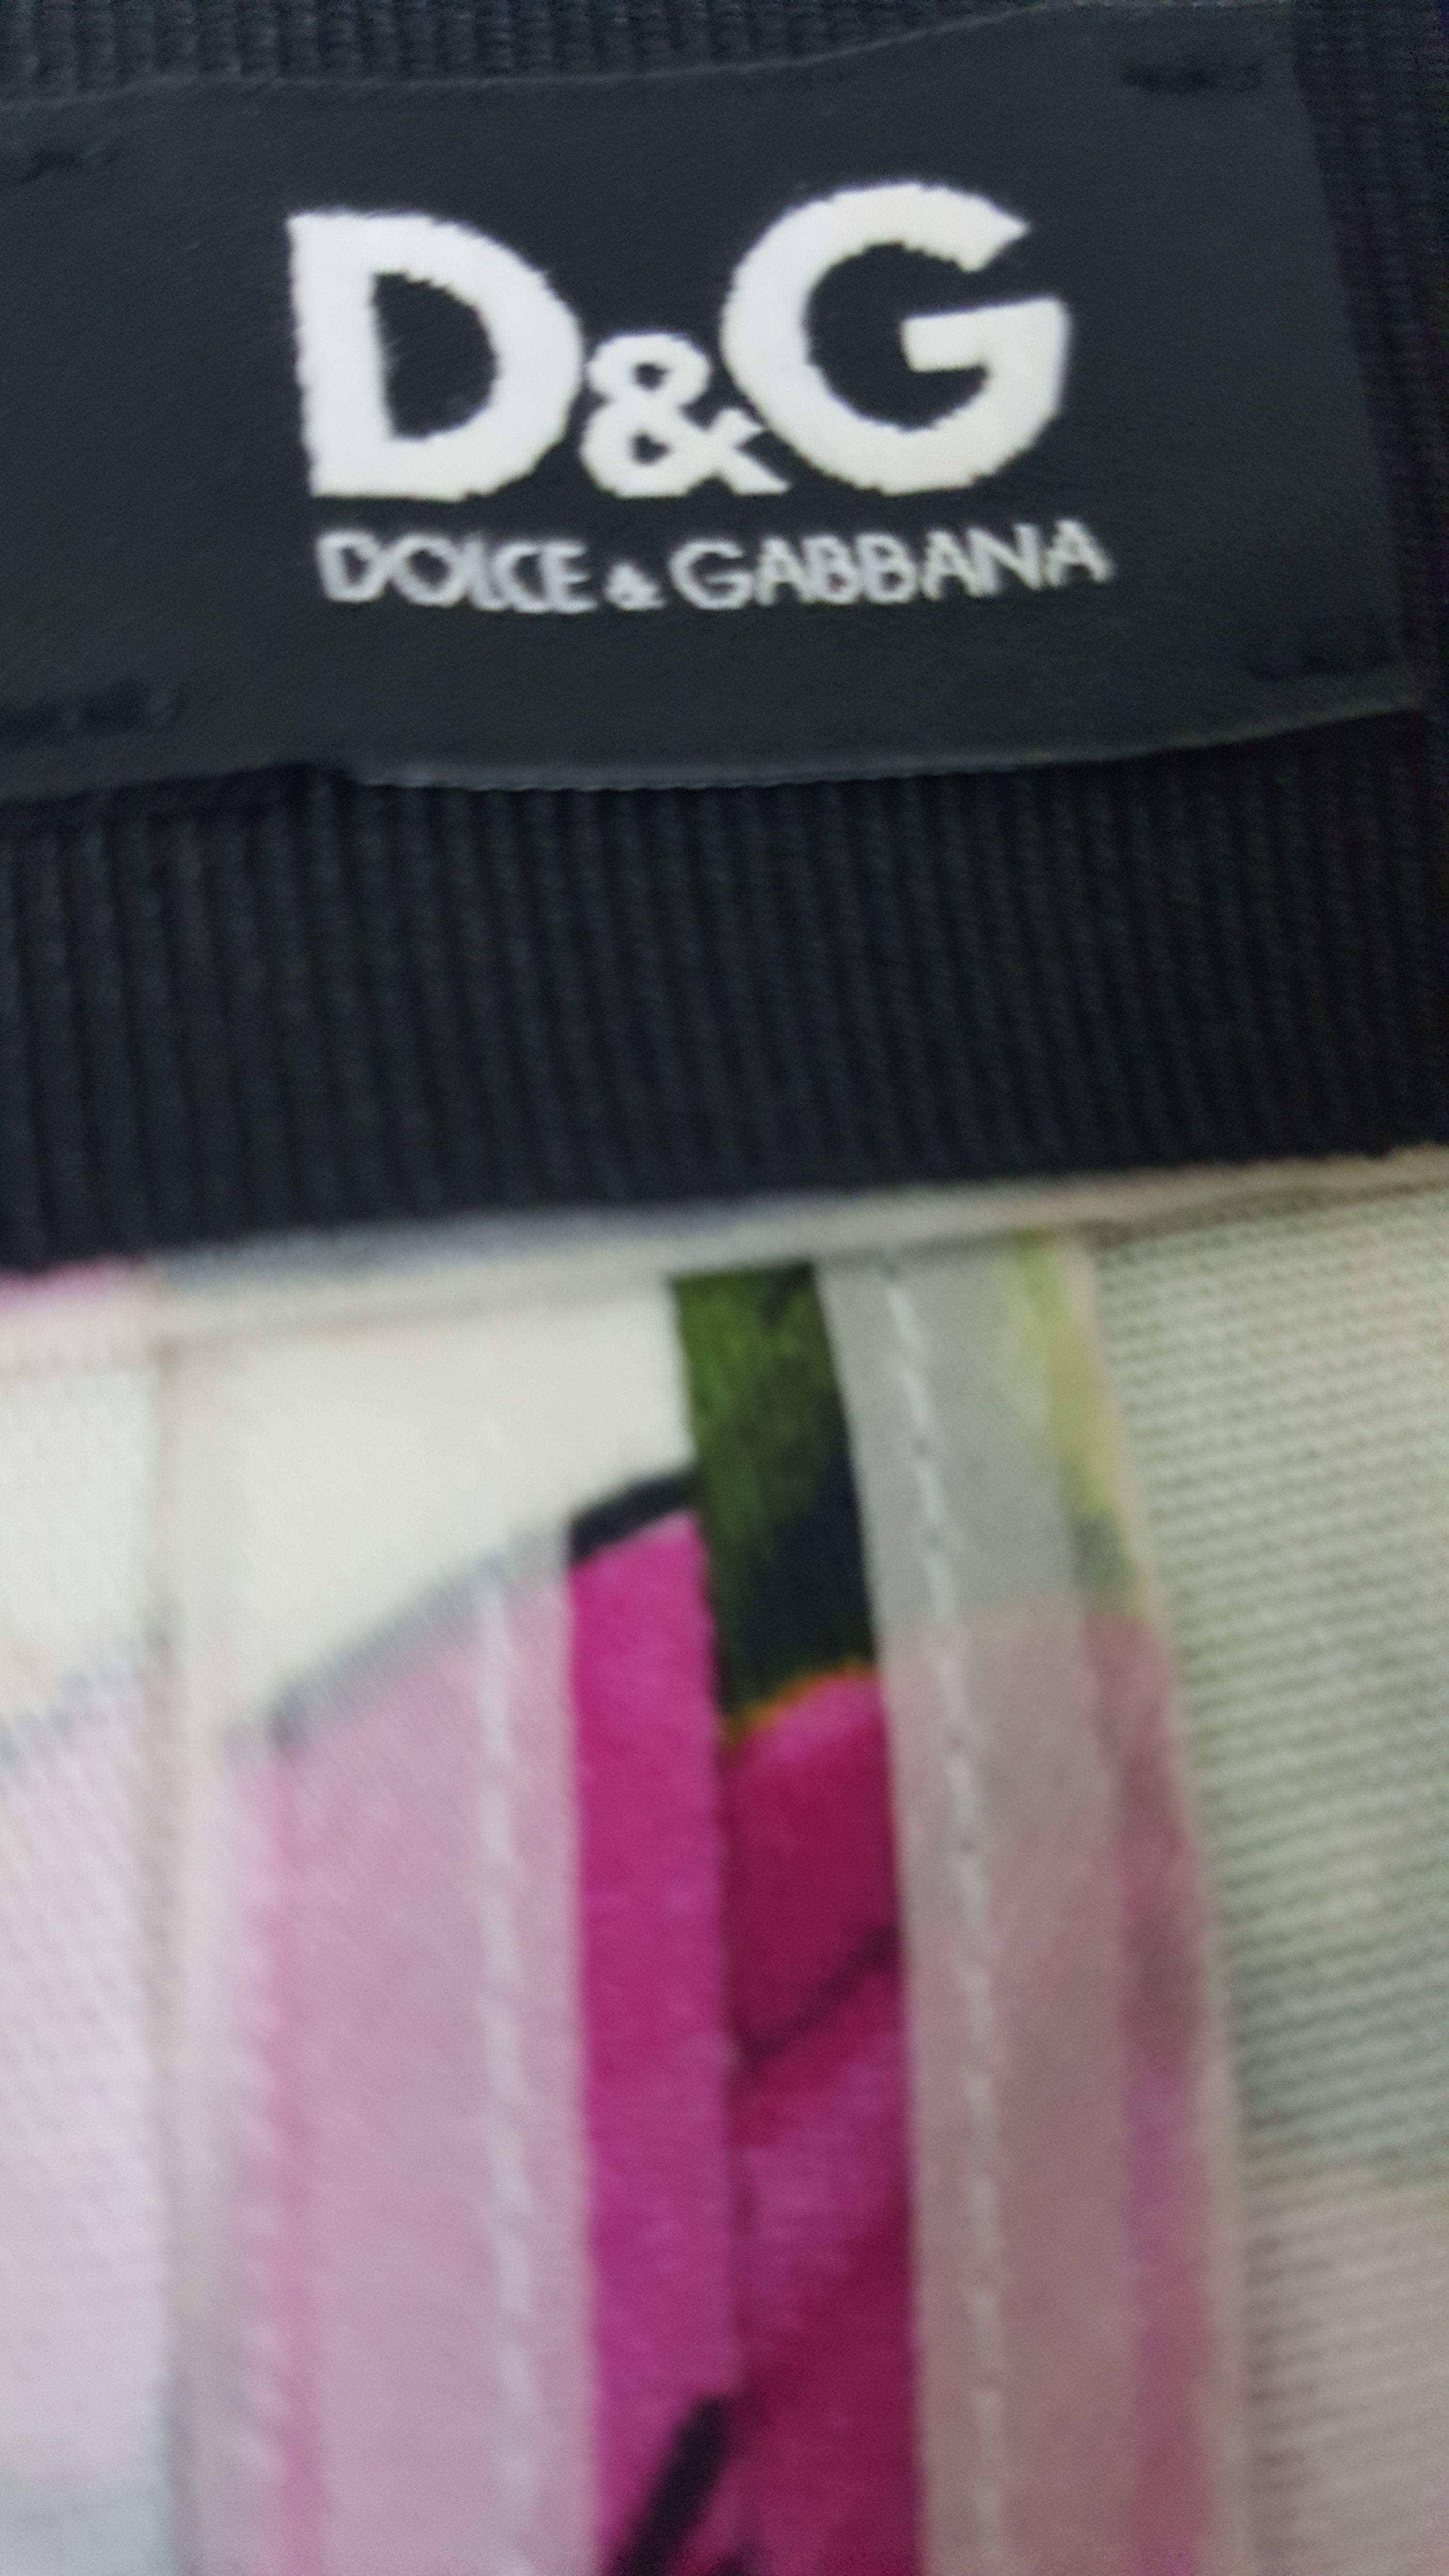 Jupes - Jupe Dolce & Gabbana